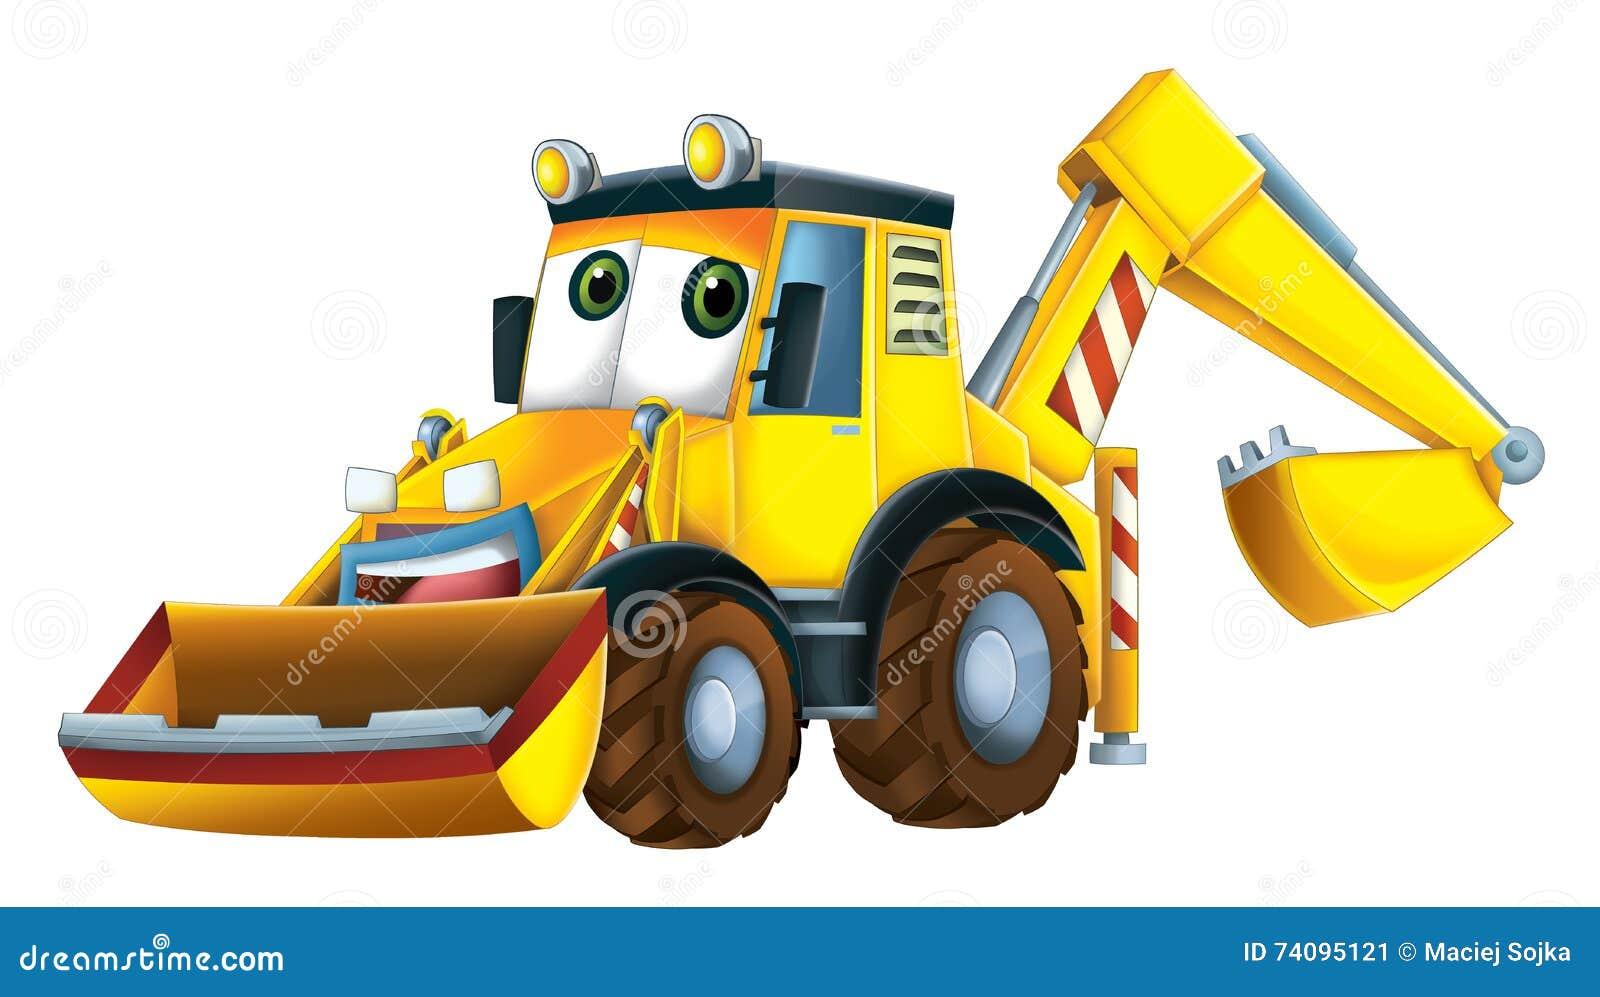 cartoon funny excavator happy colorful traditional illustration children